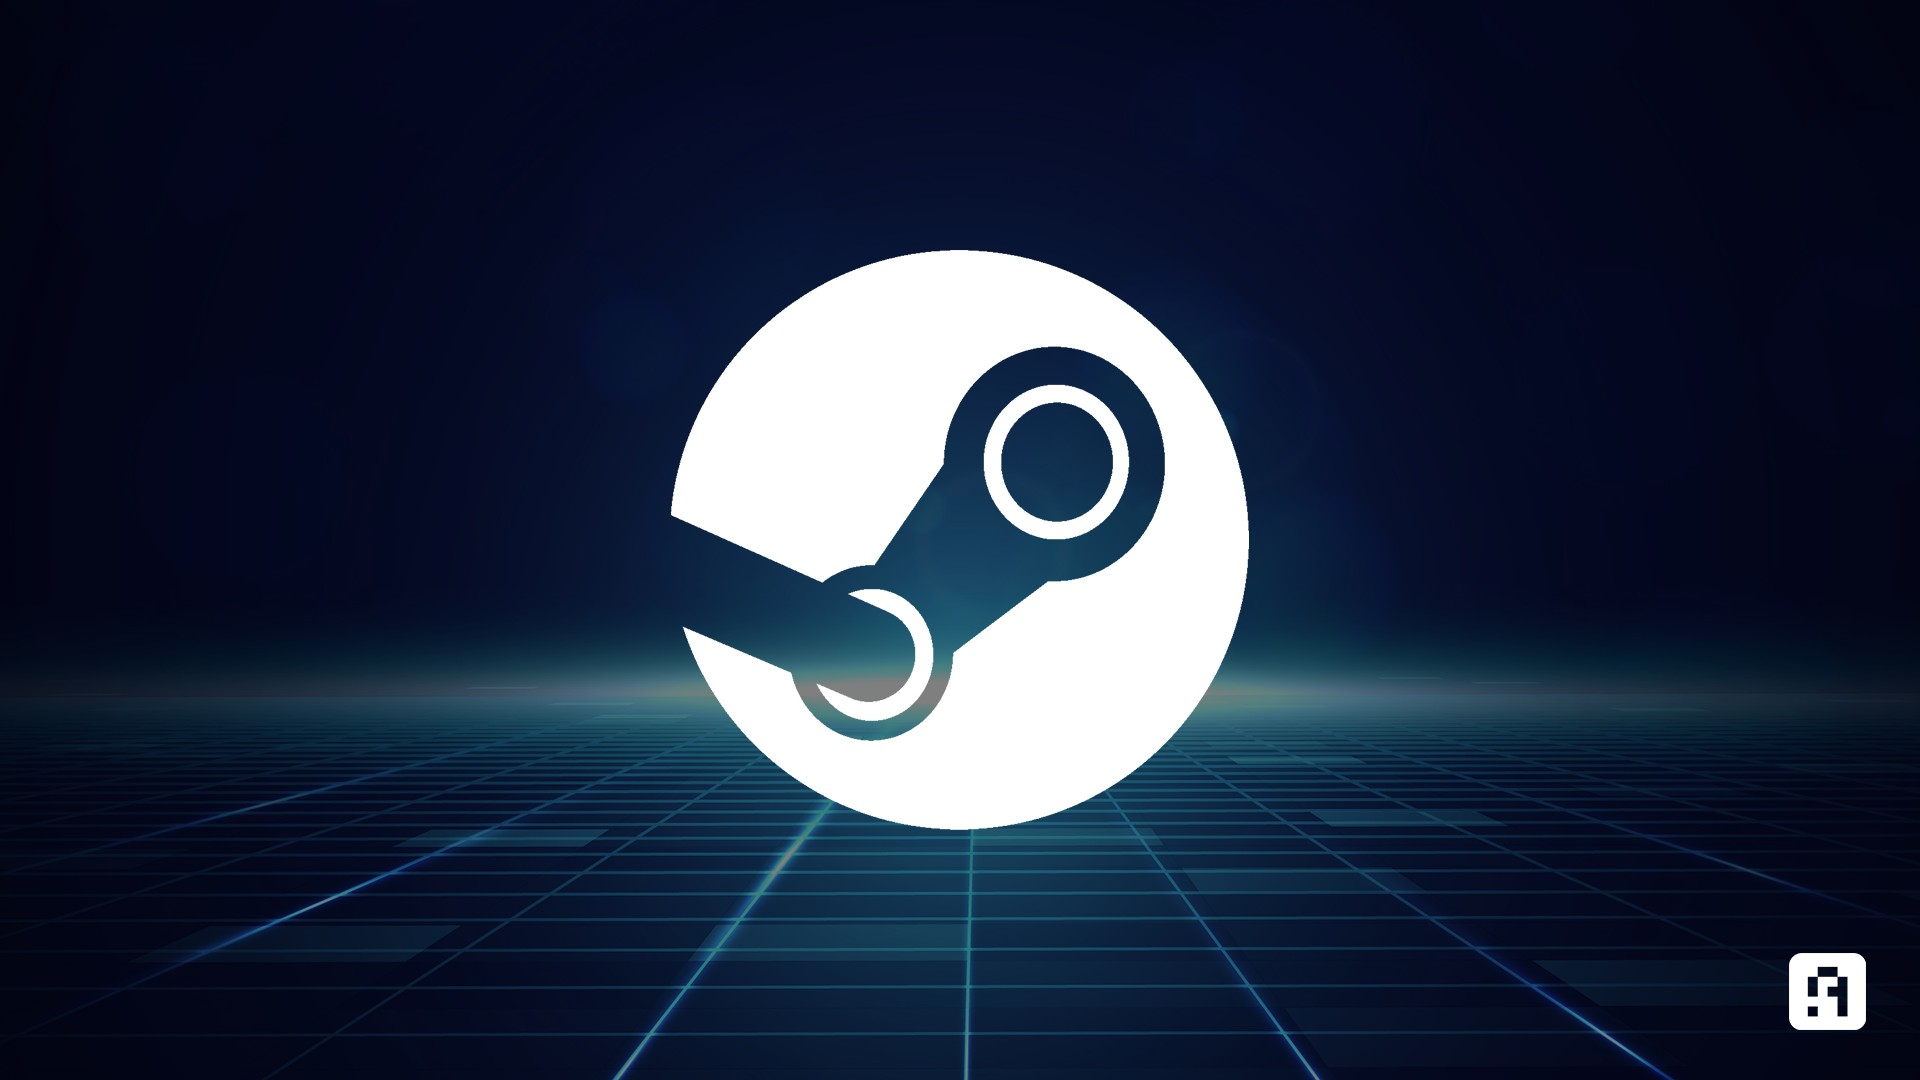 Steam ستيم - Arabhardware Generic Photos